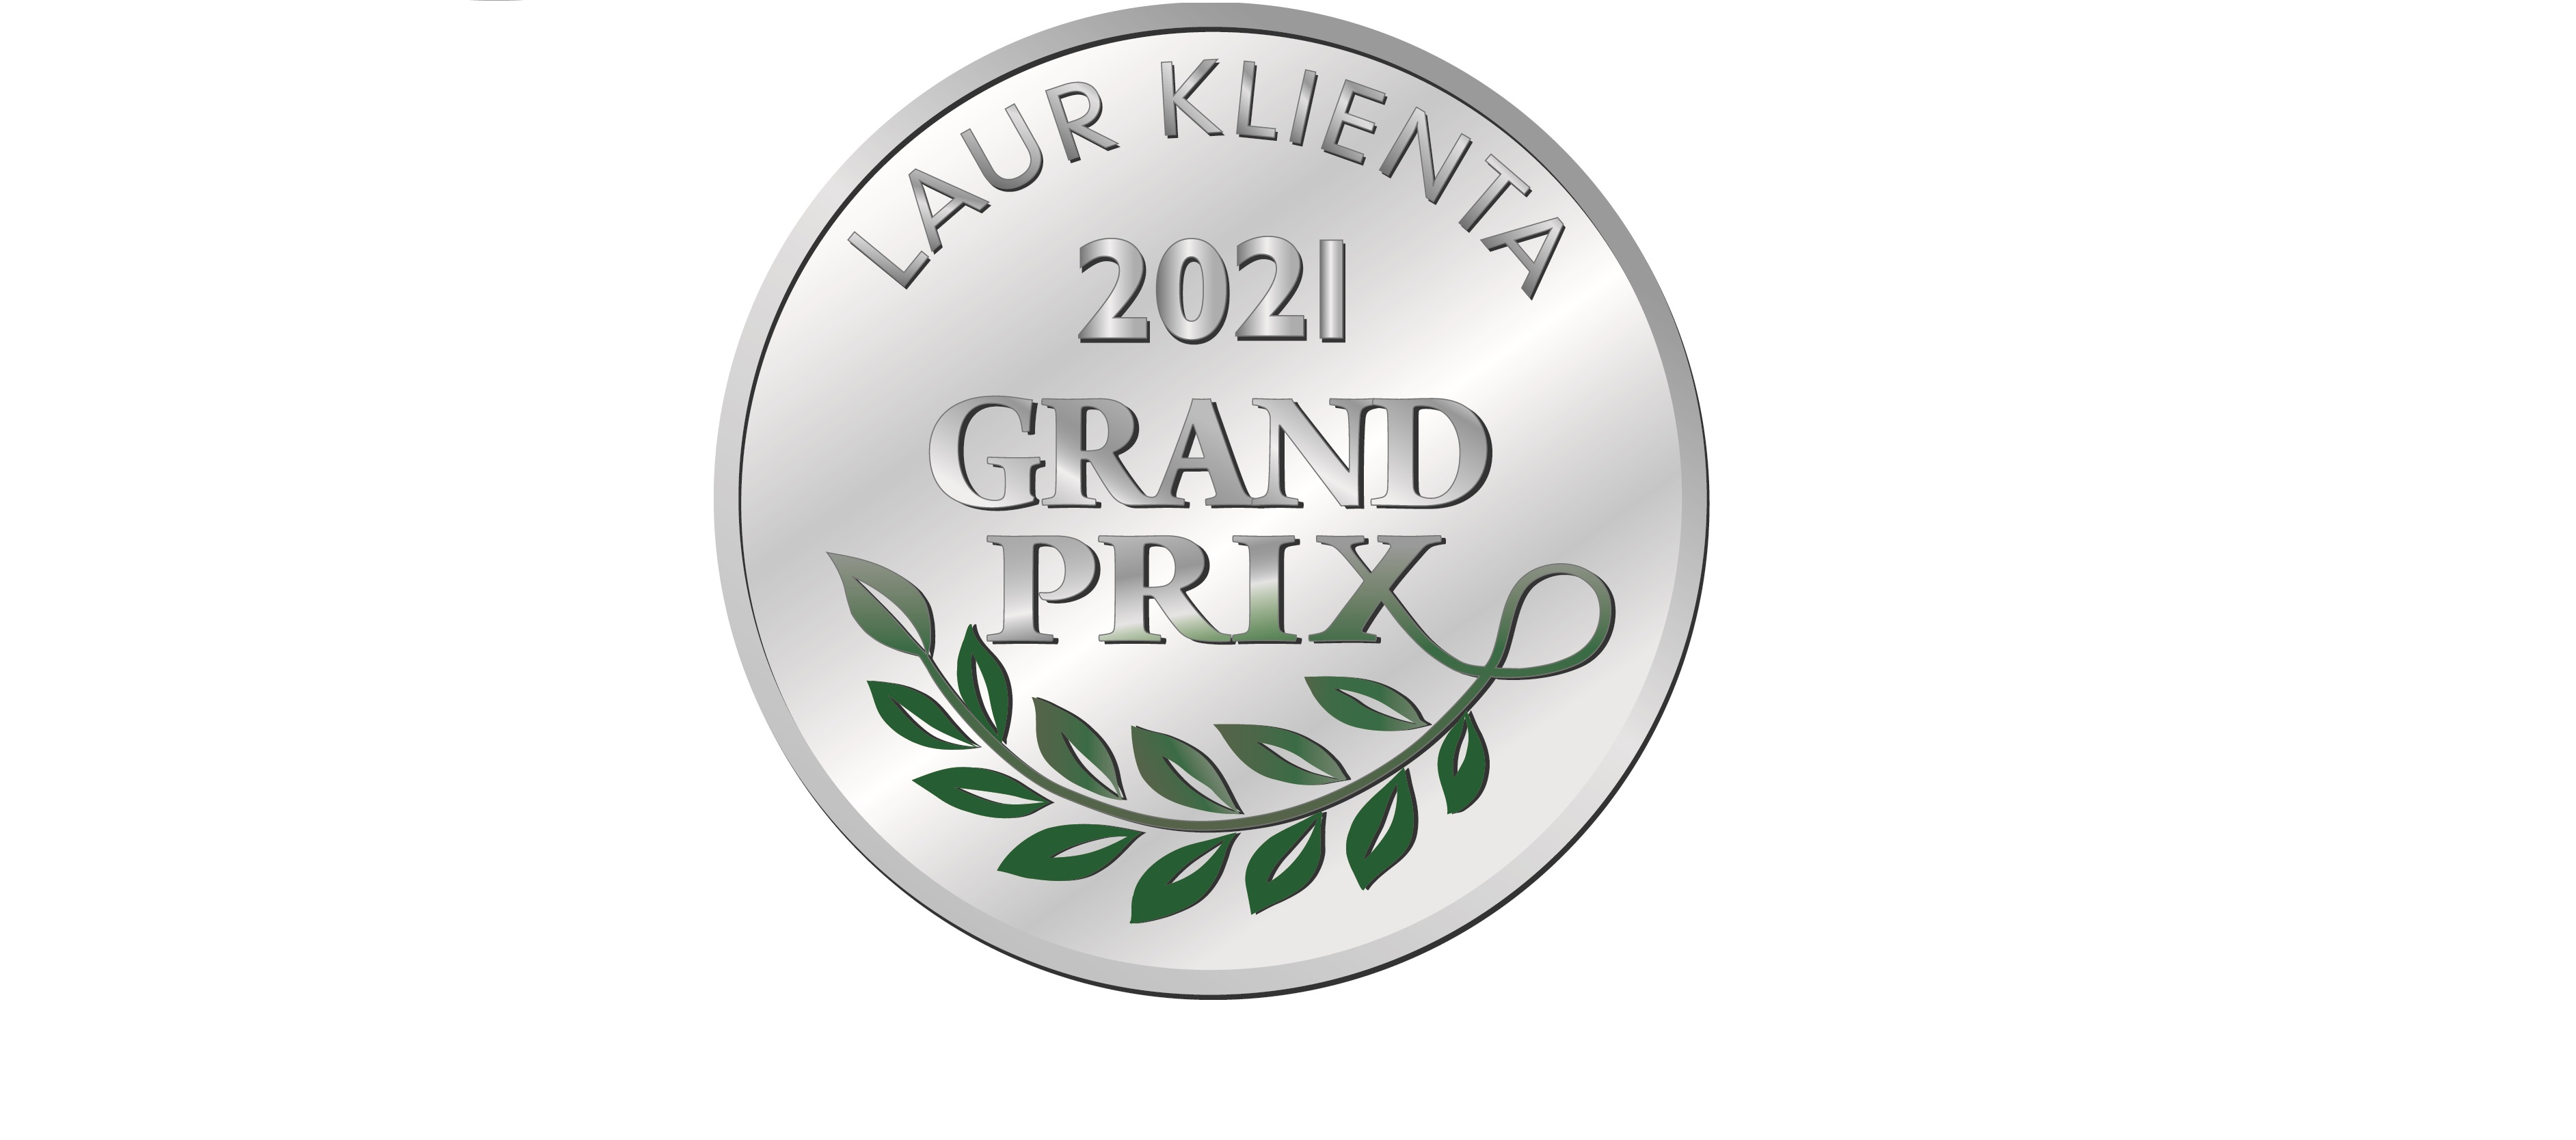 Grand Prix w plebiscycie Laur Klienta dla Moya